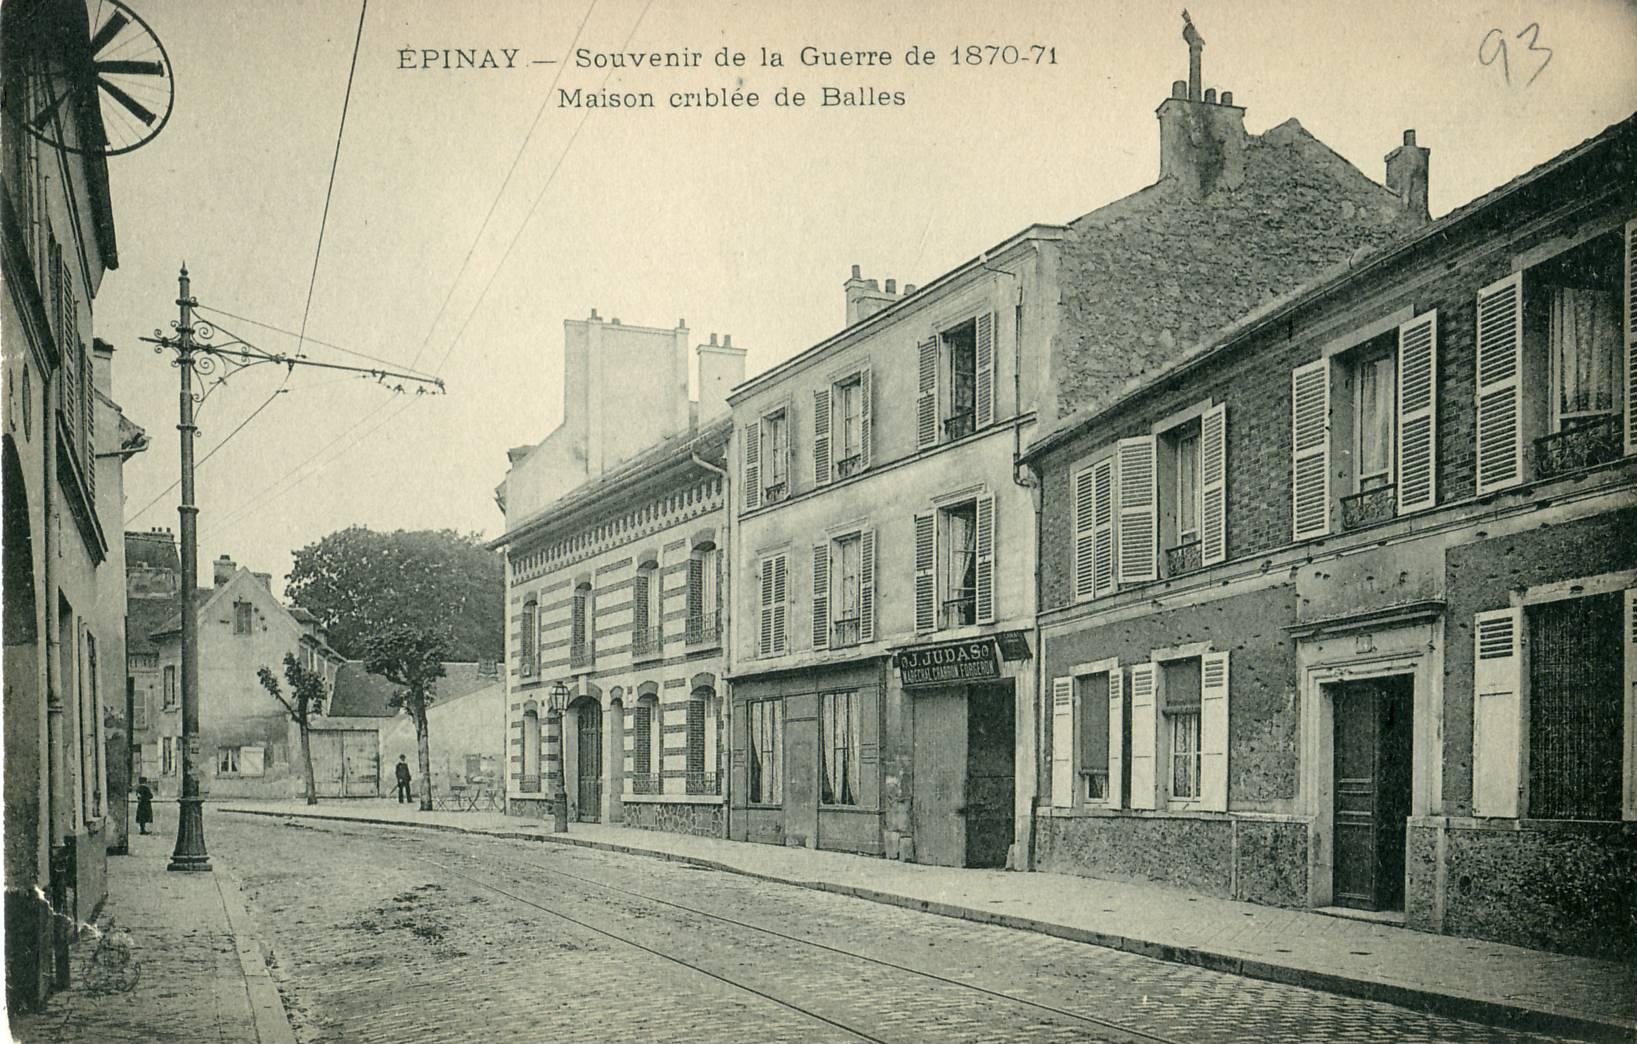 Epinay-sur-Seine France  city photos gallery : Epinay sur Seine